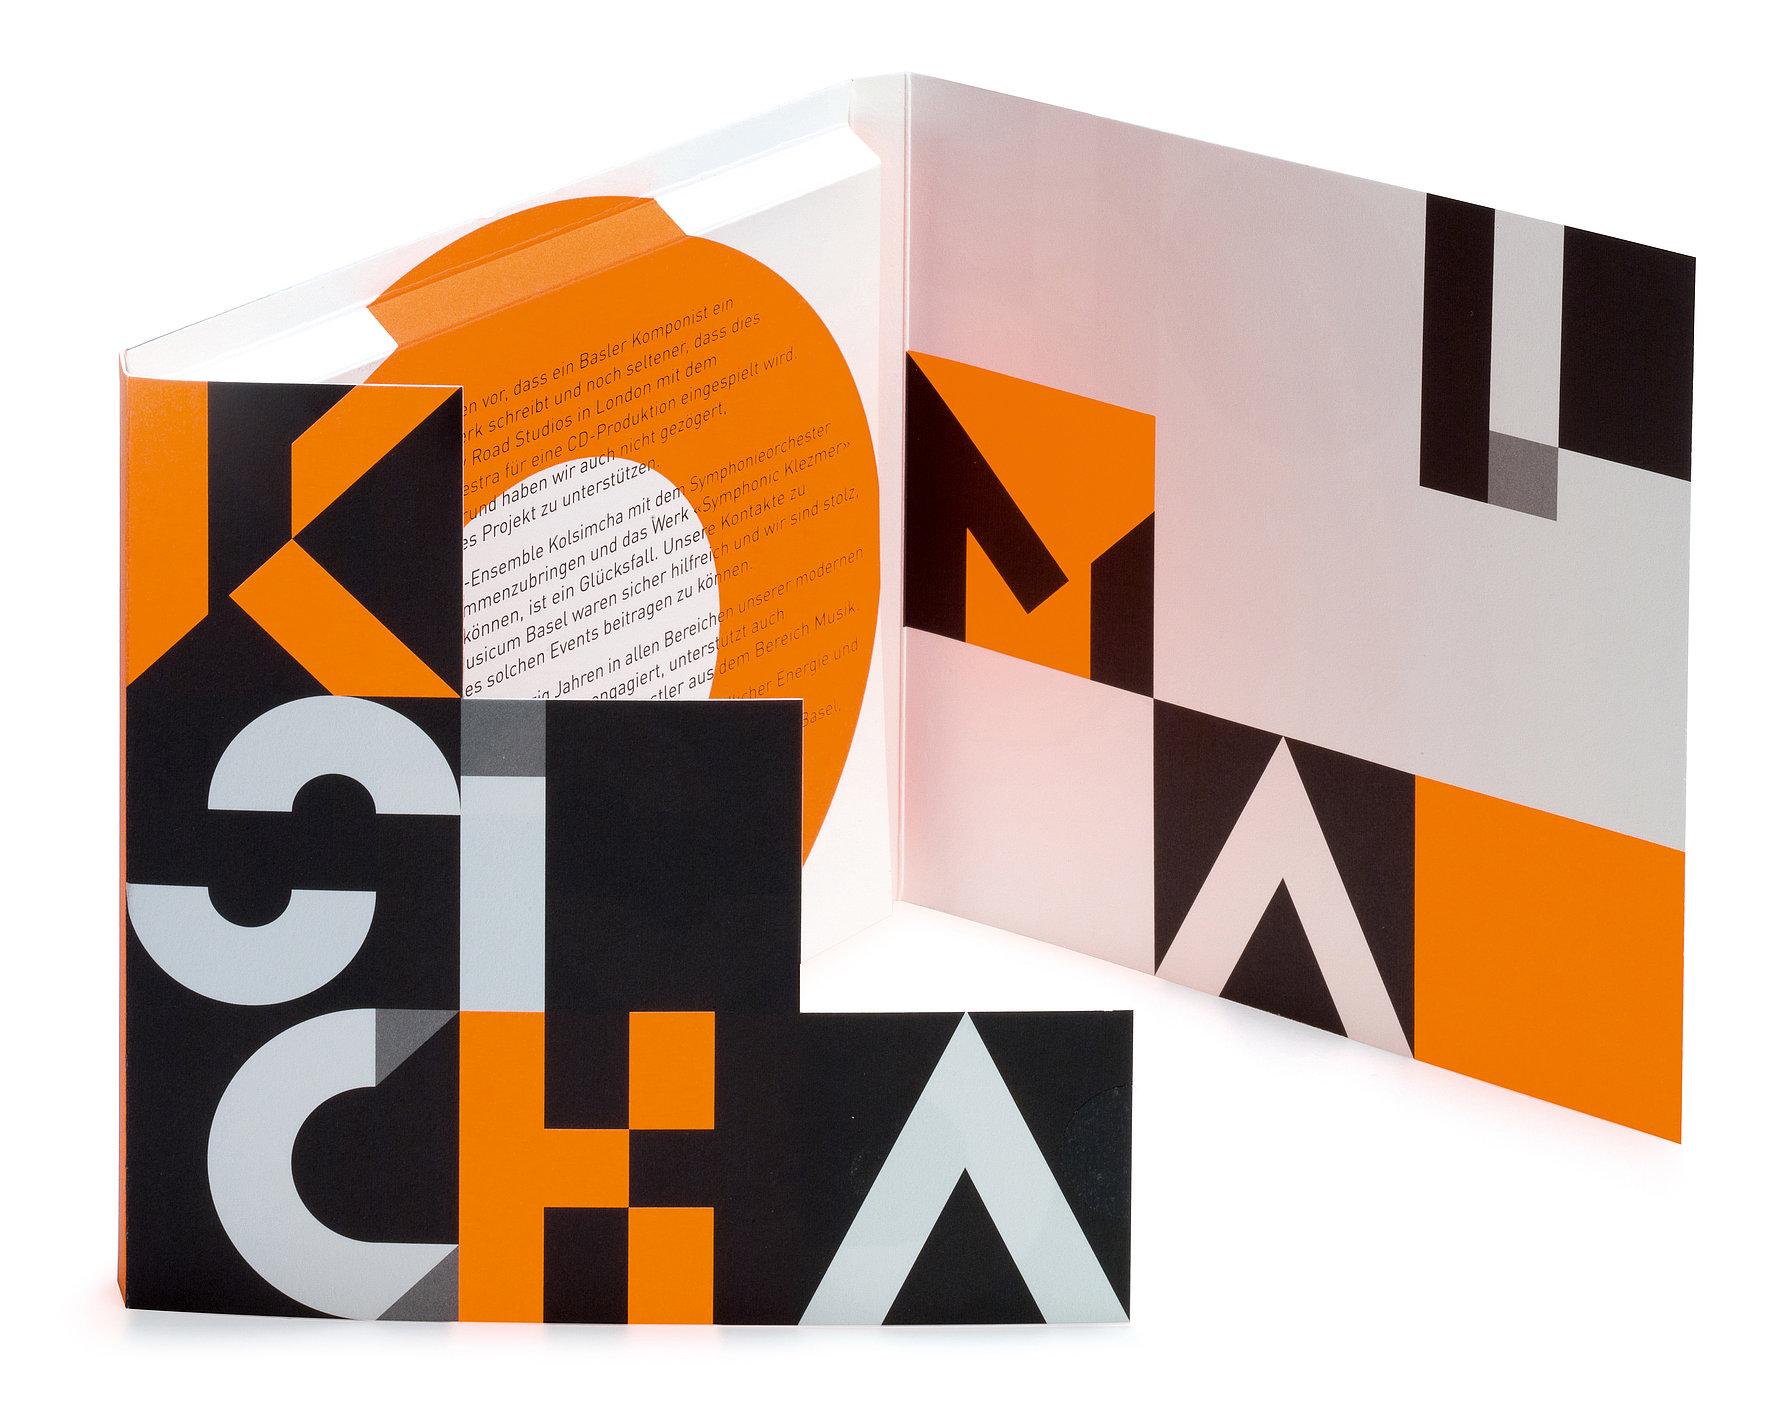 Kolsimcha   Red Dot Design Award